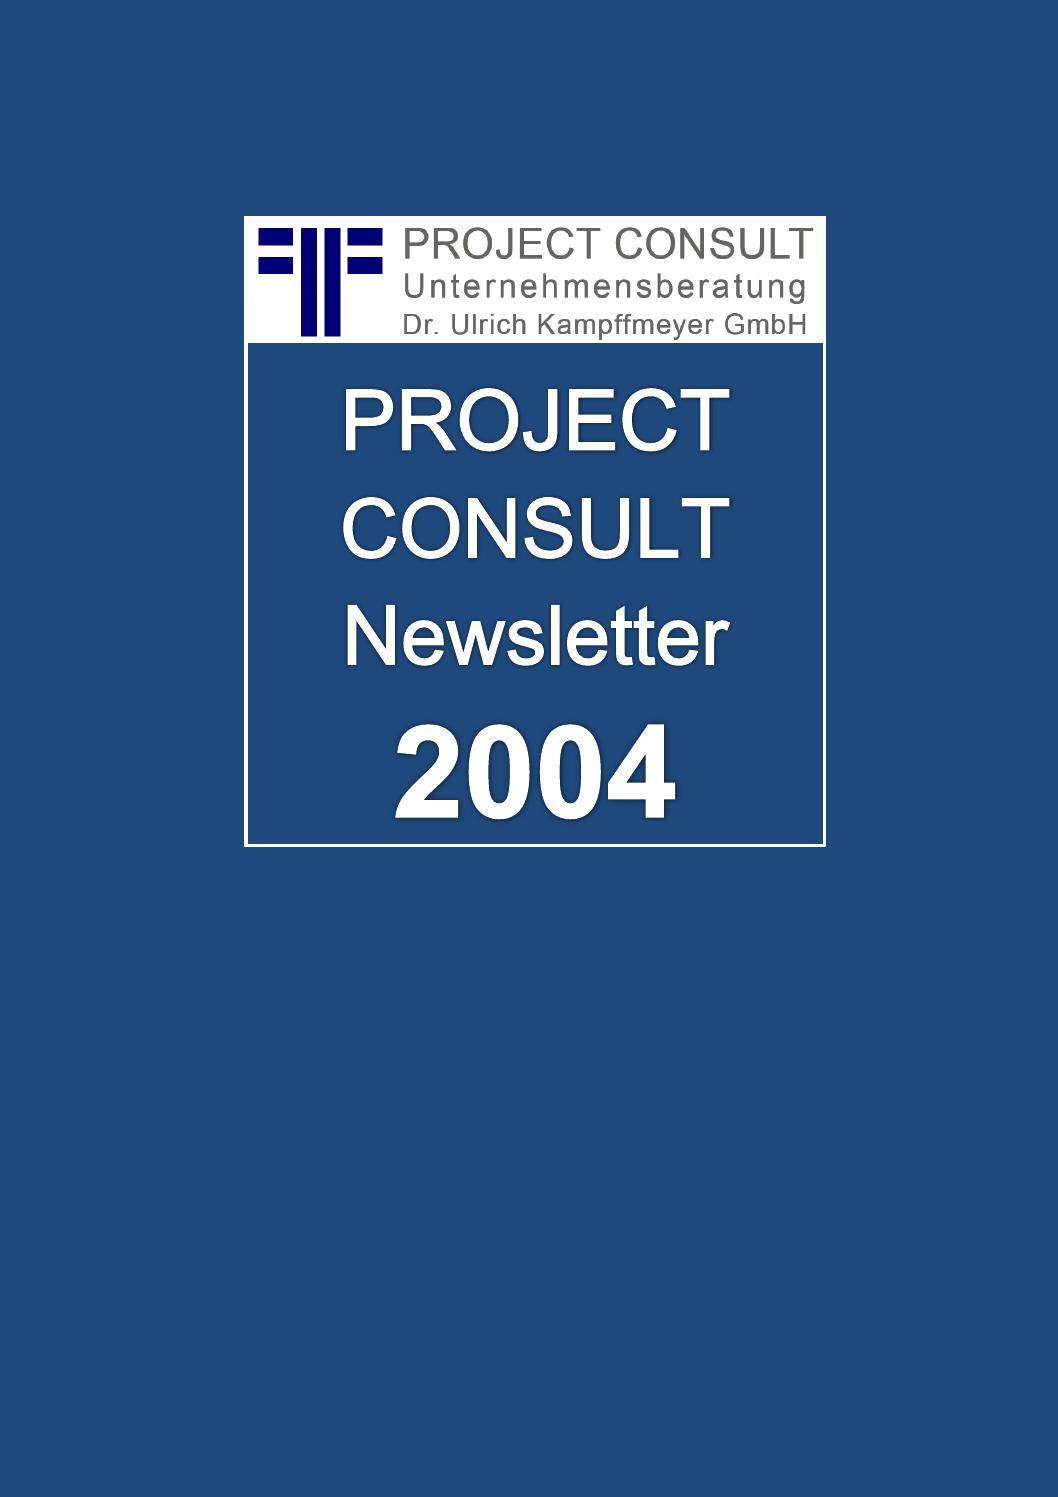 DE] PROJECT CONSULT Newsletter 2004 | Dr. Ulrich Kampffmeyer ...